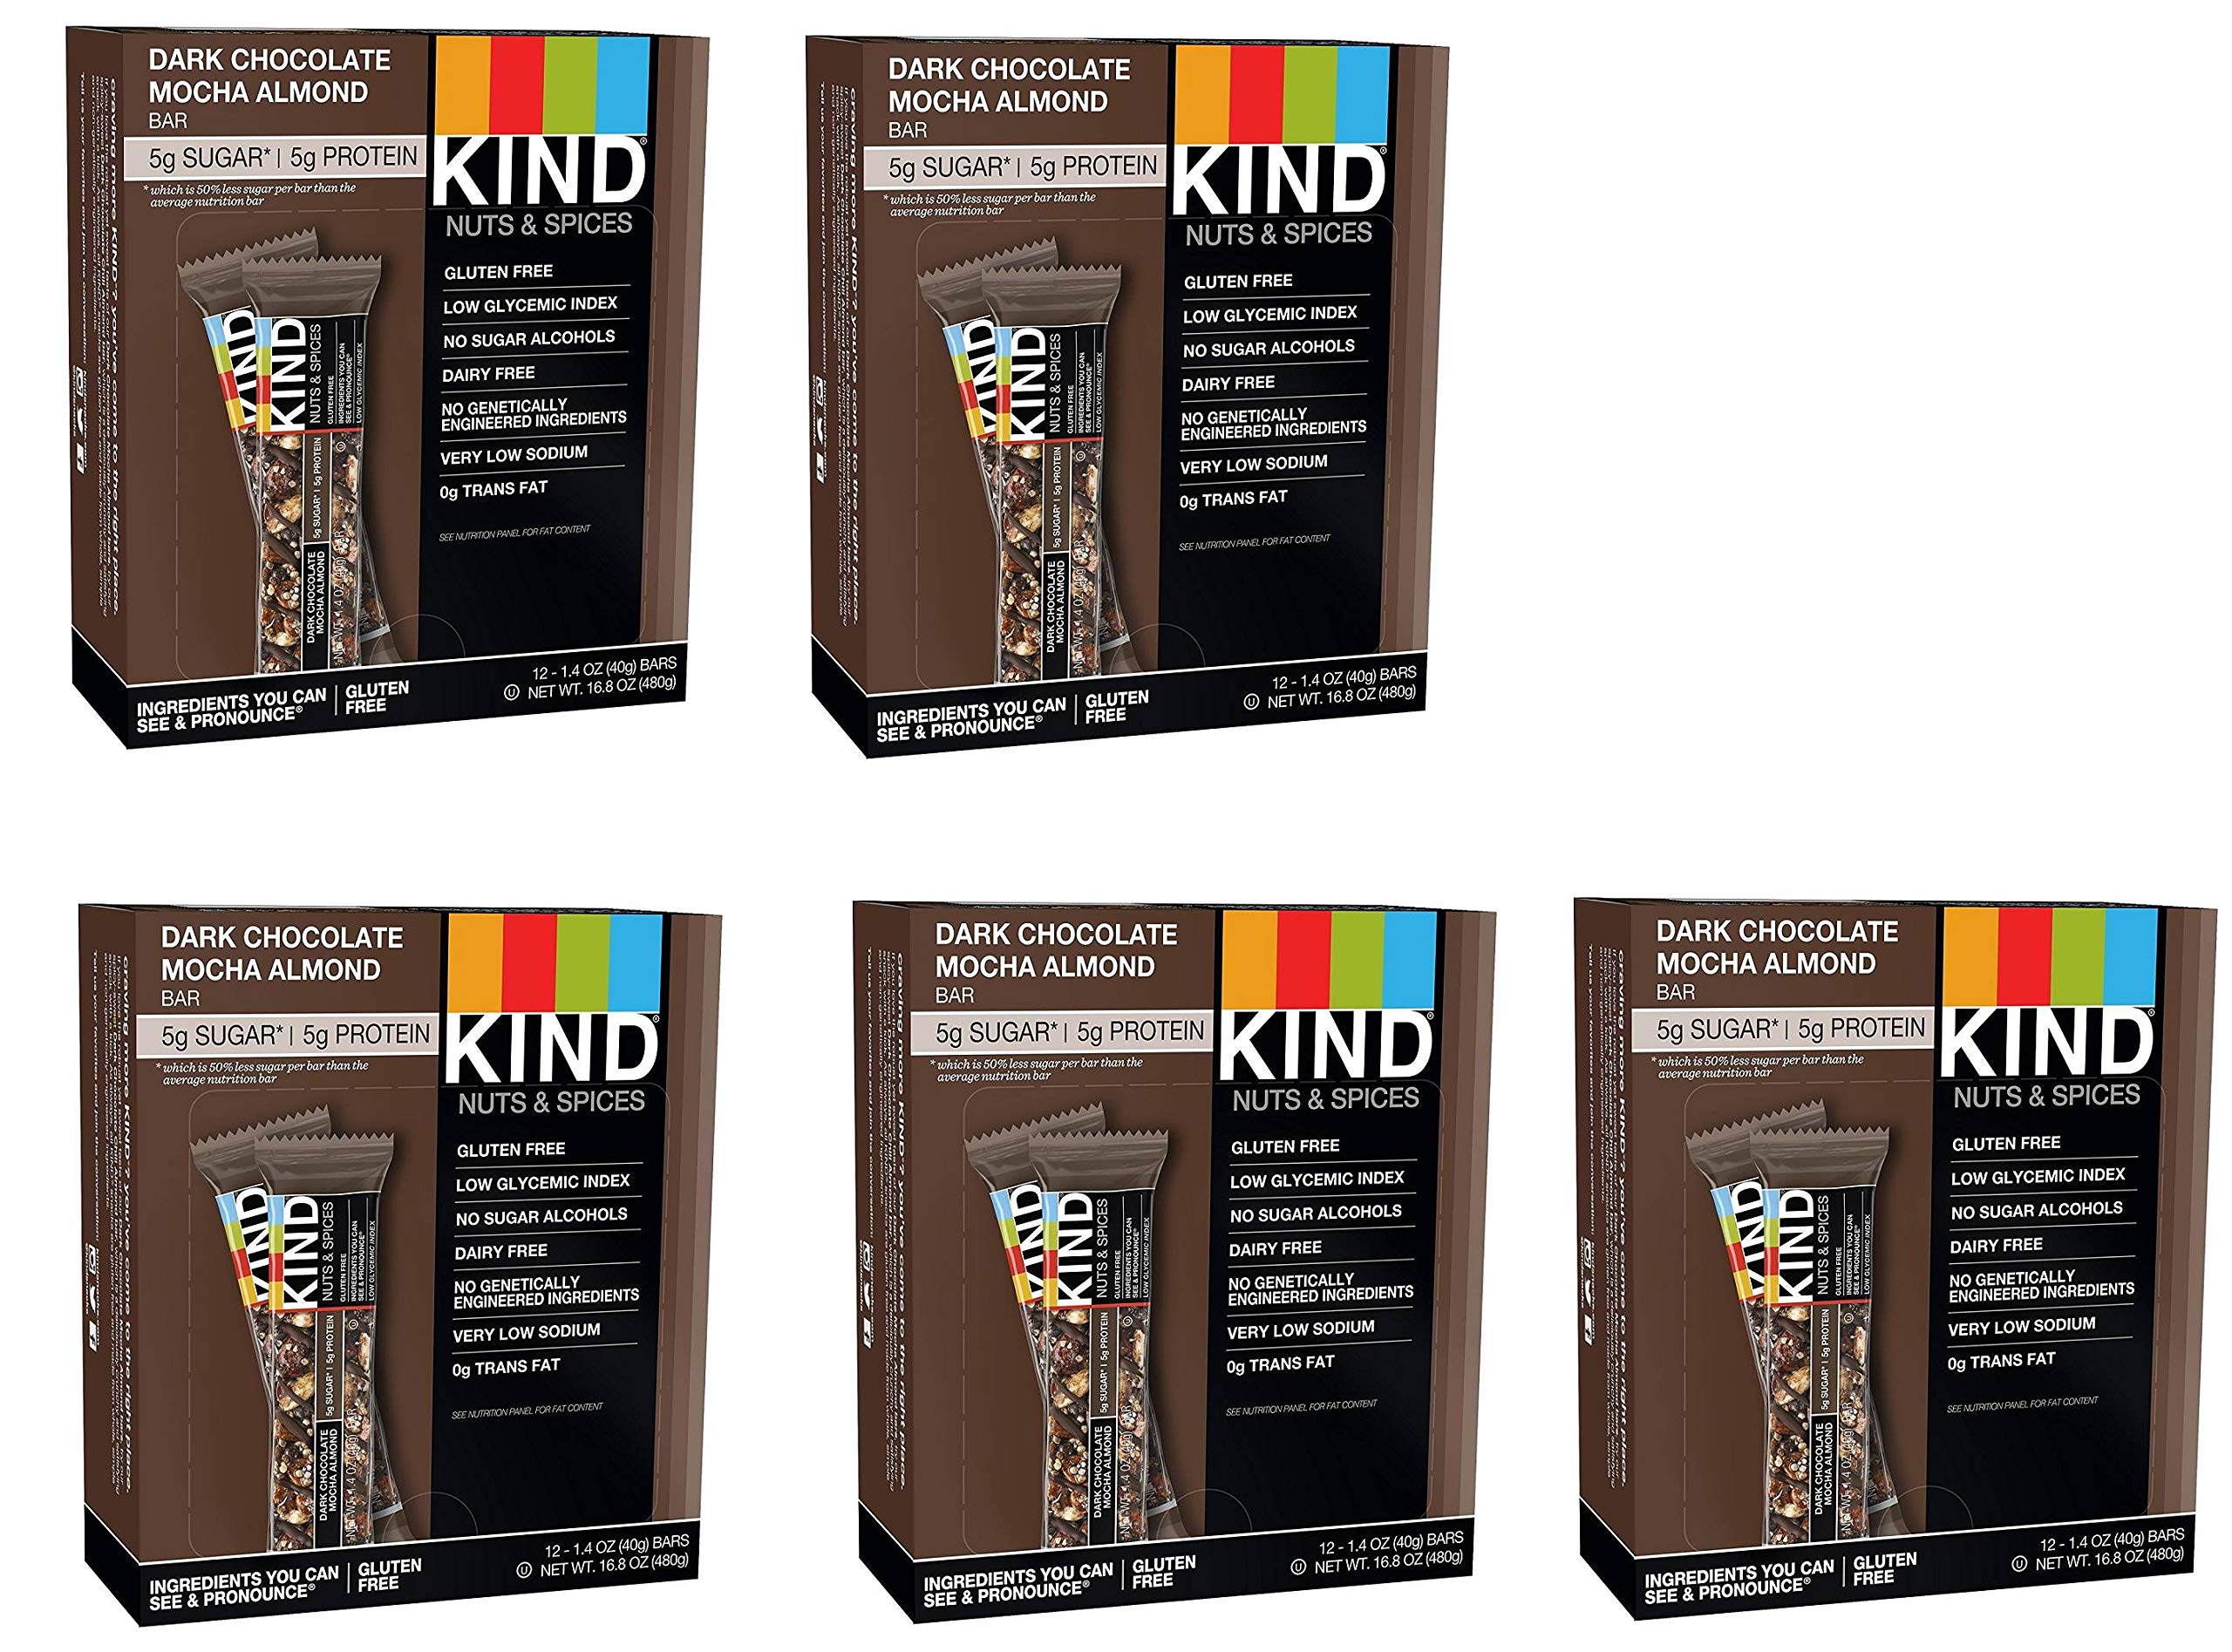 KIND Bars, Dark Chocolate Mocha Almond, Gluten Free, Low Sugar, 1.4oz, 60 Bars